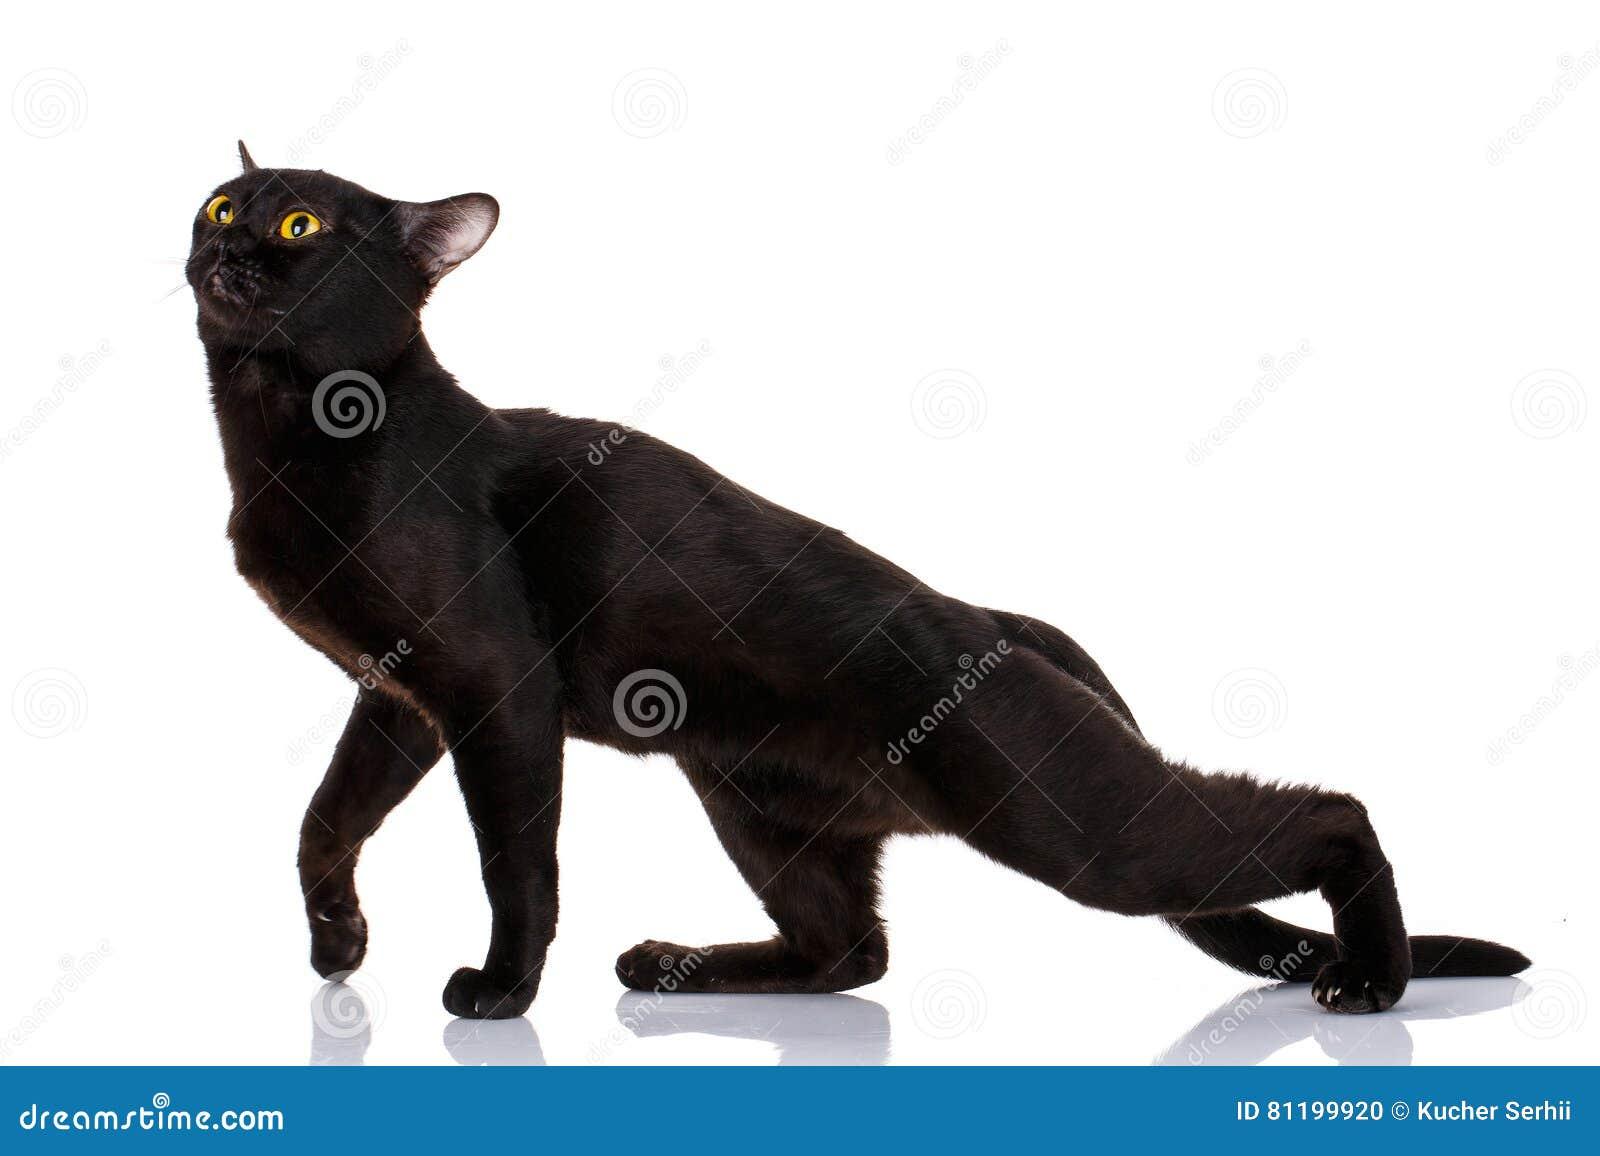 finest selection 8489b 3c6fb Schwarze Katze Bombays Verbog Einen Puma Stockfoto - Bild ...